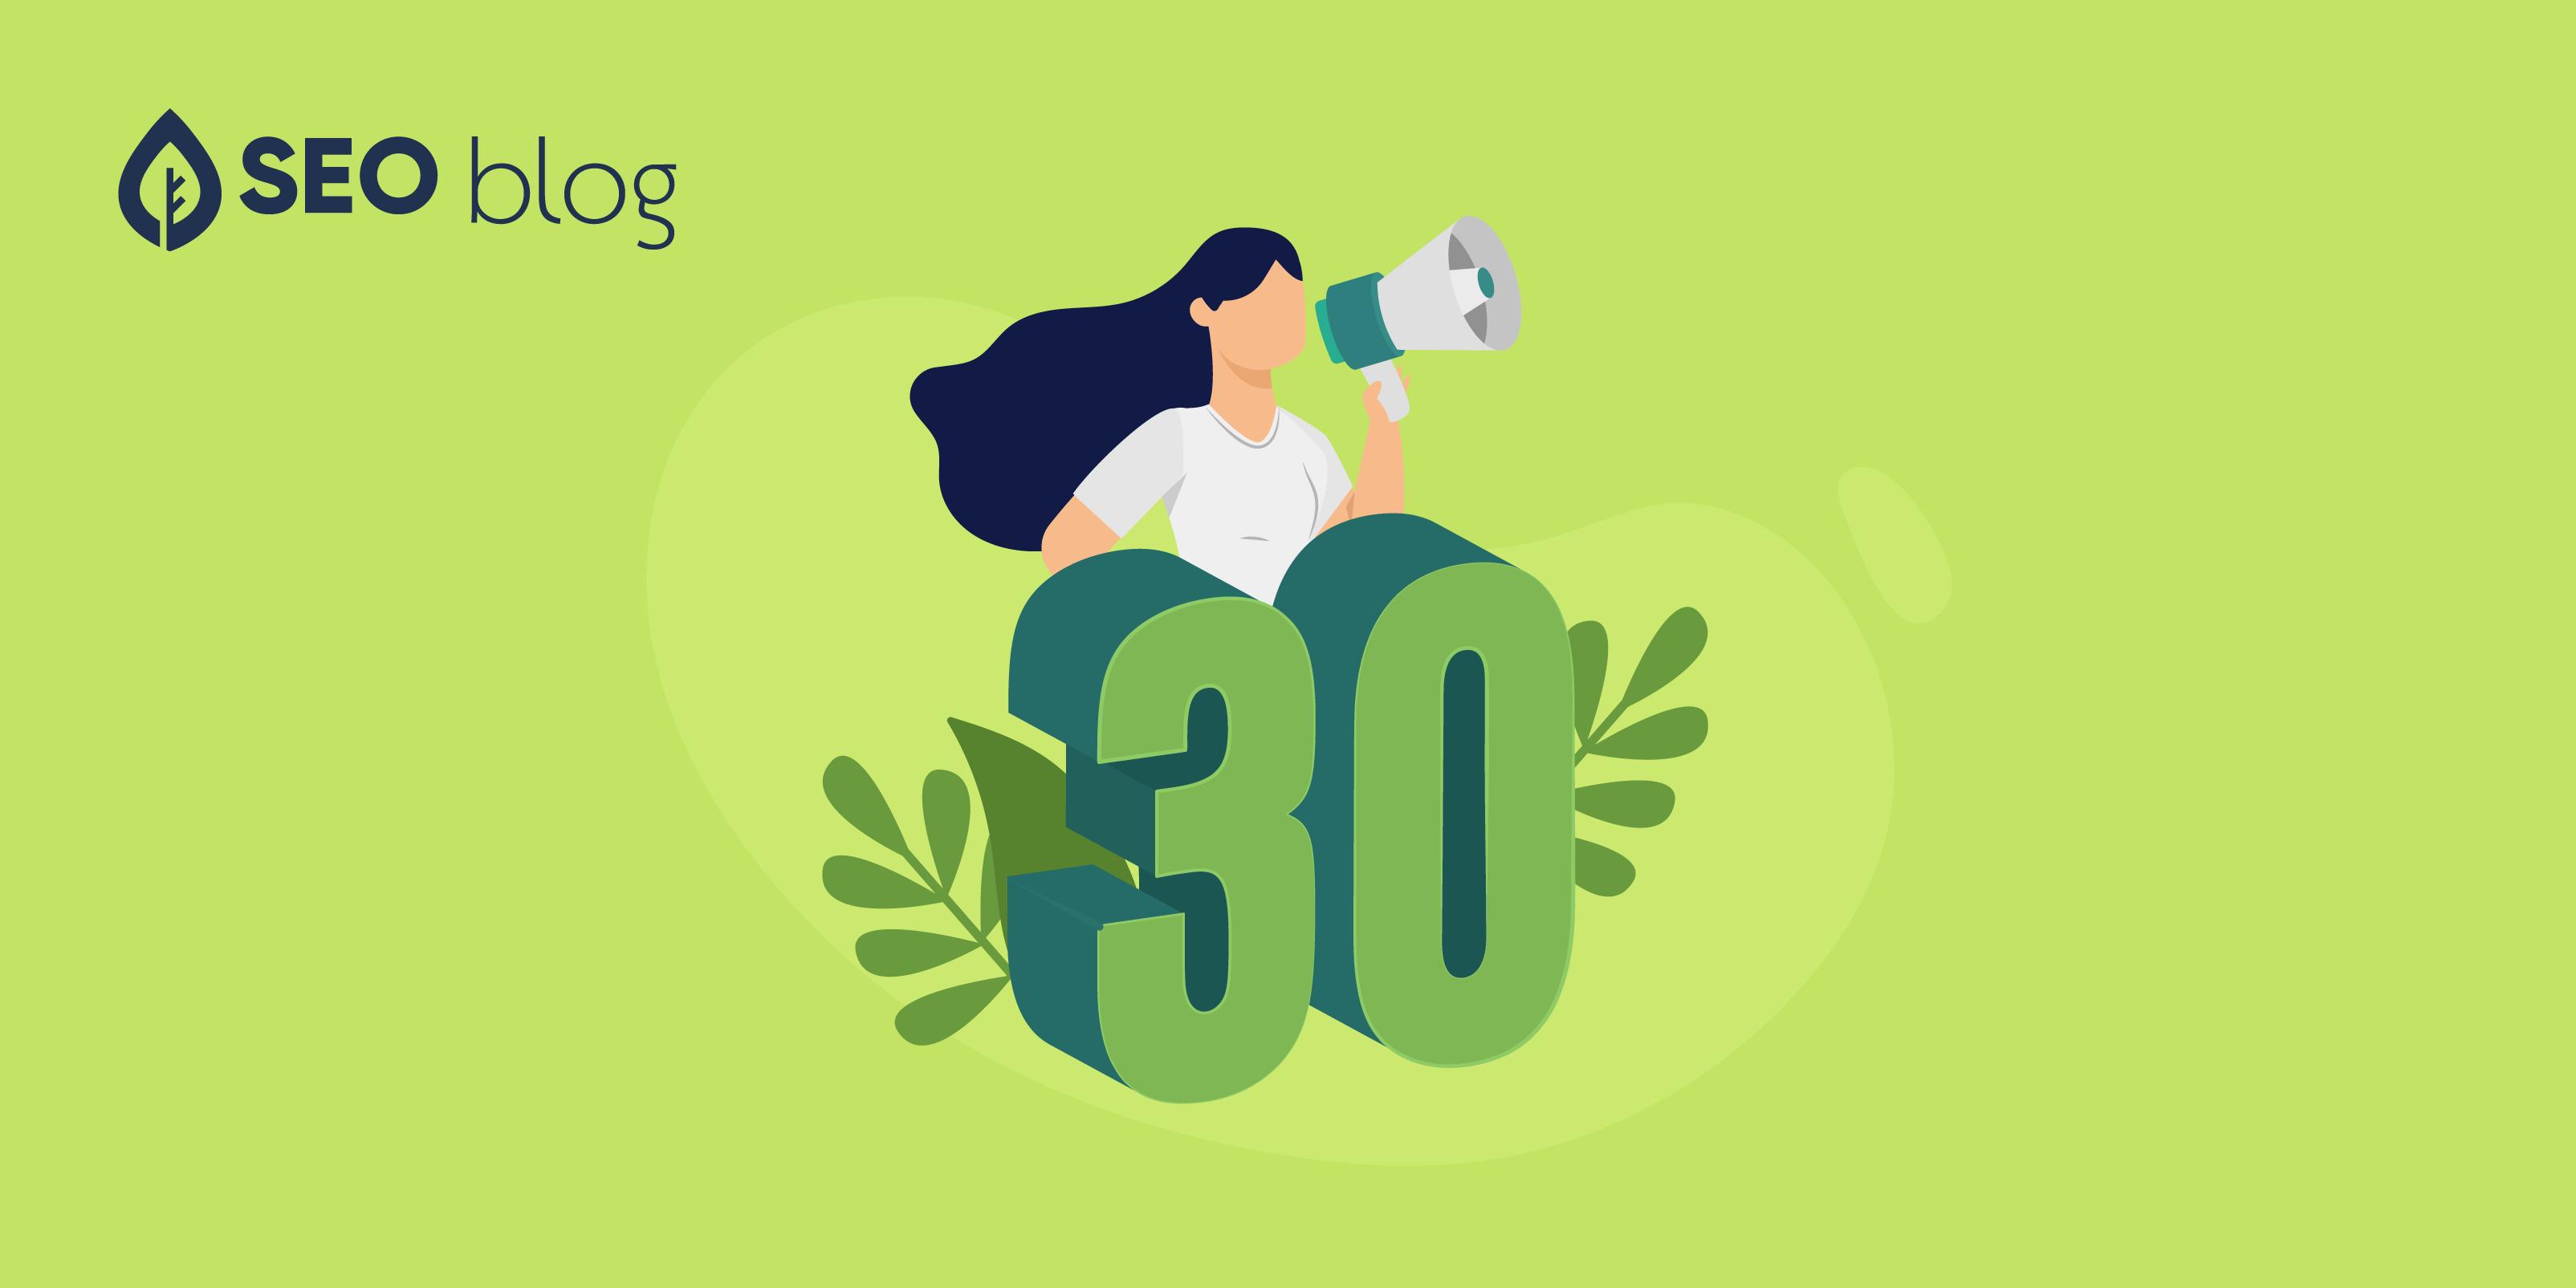 Seoblog 30 Tips for New for StumbleUpon Marketers